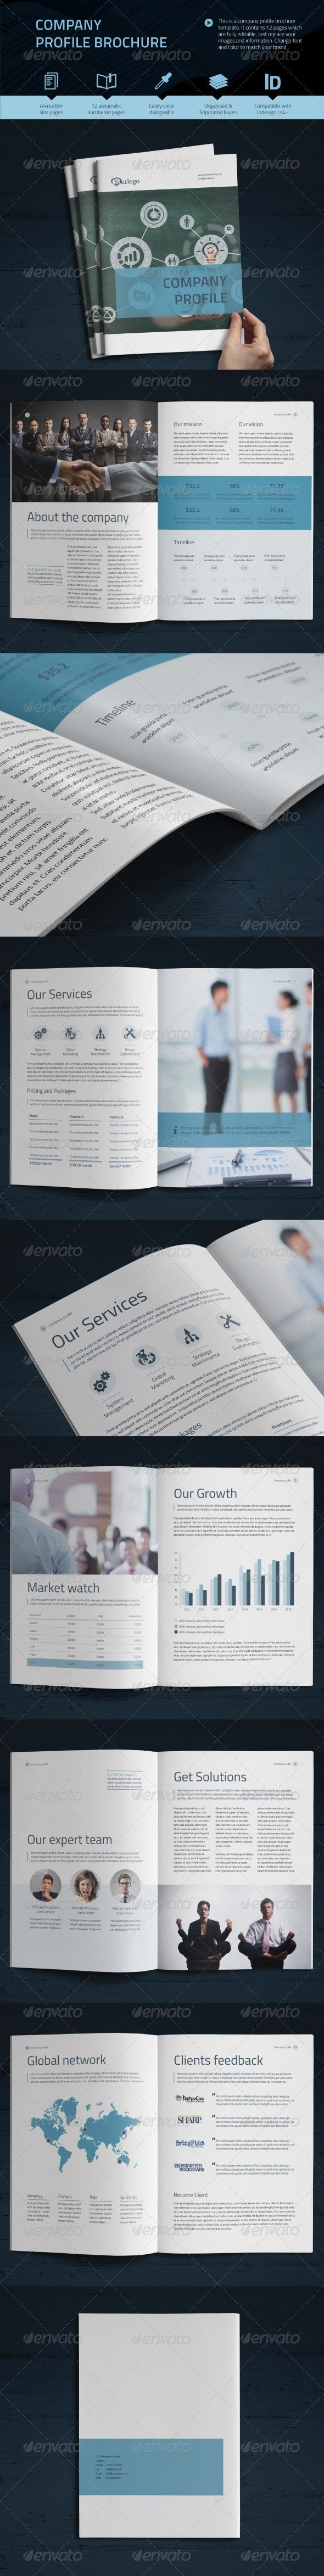 Company Profile Vol.2 - Informational Brochures